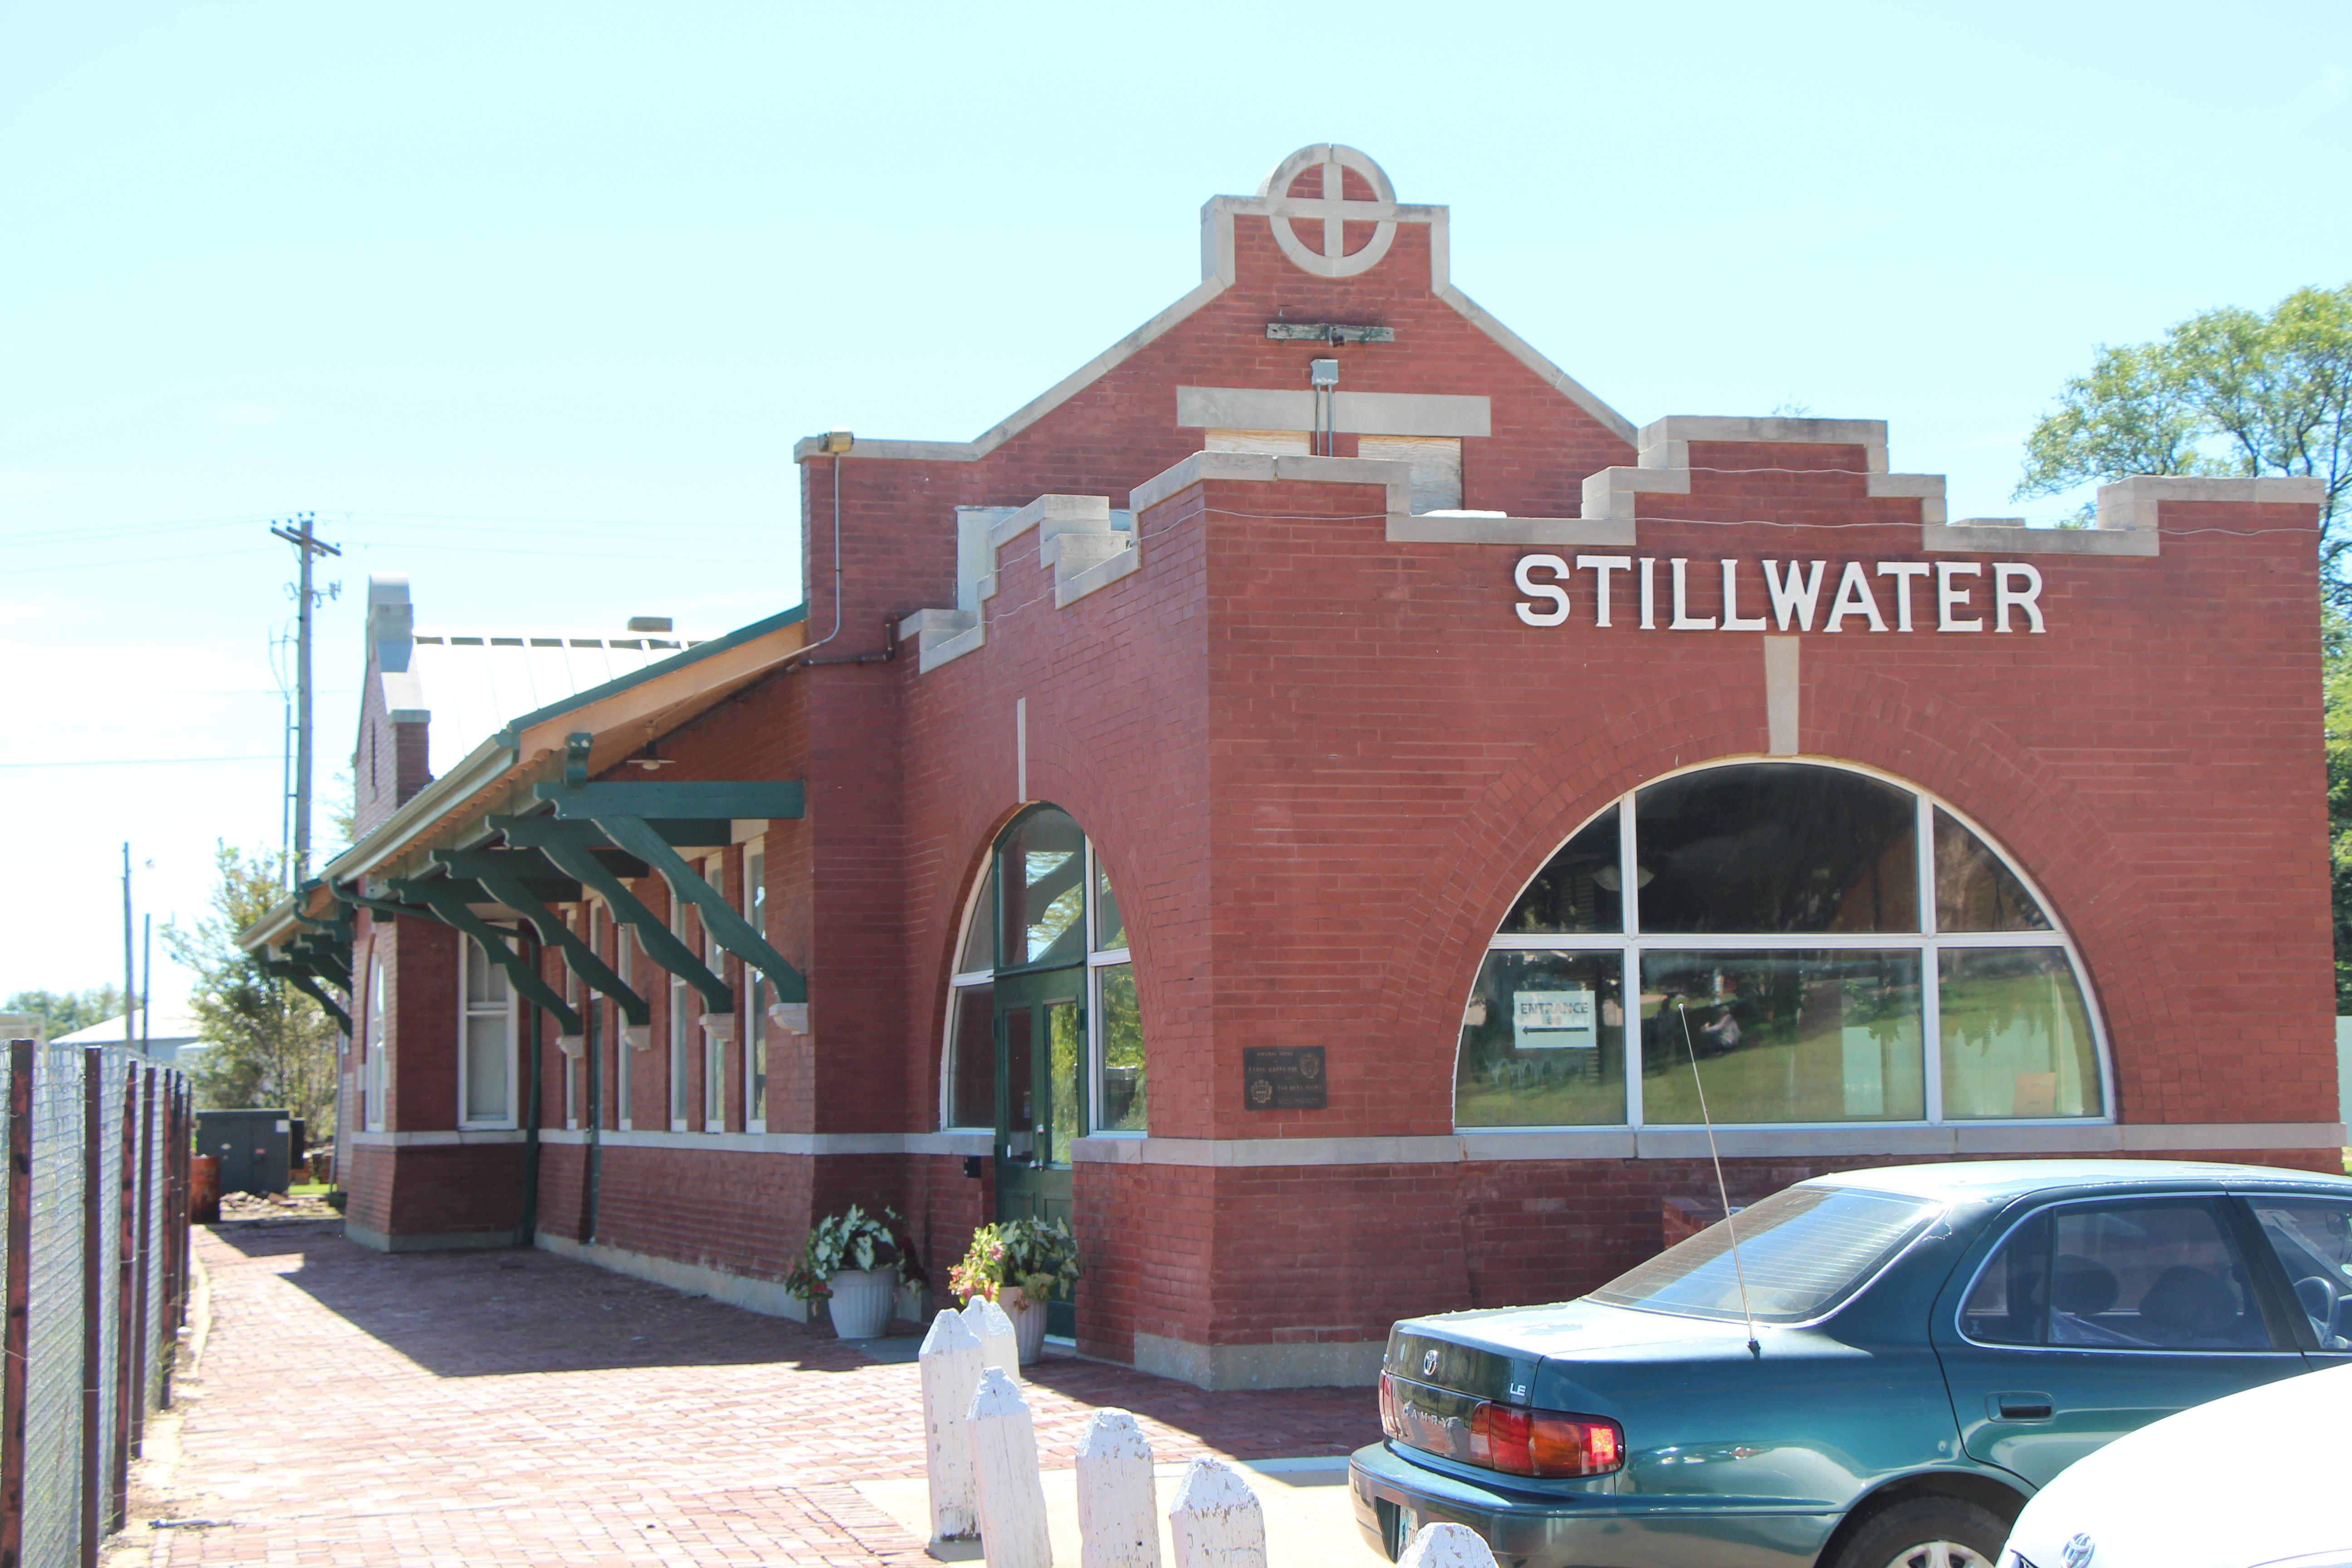 Stillwater Santa Fe Depot Wikipedia